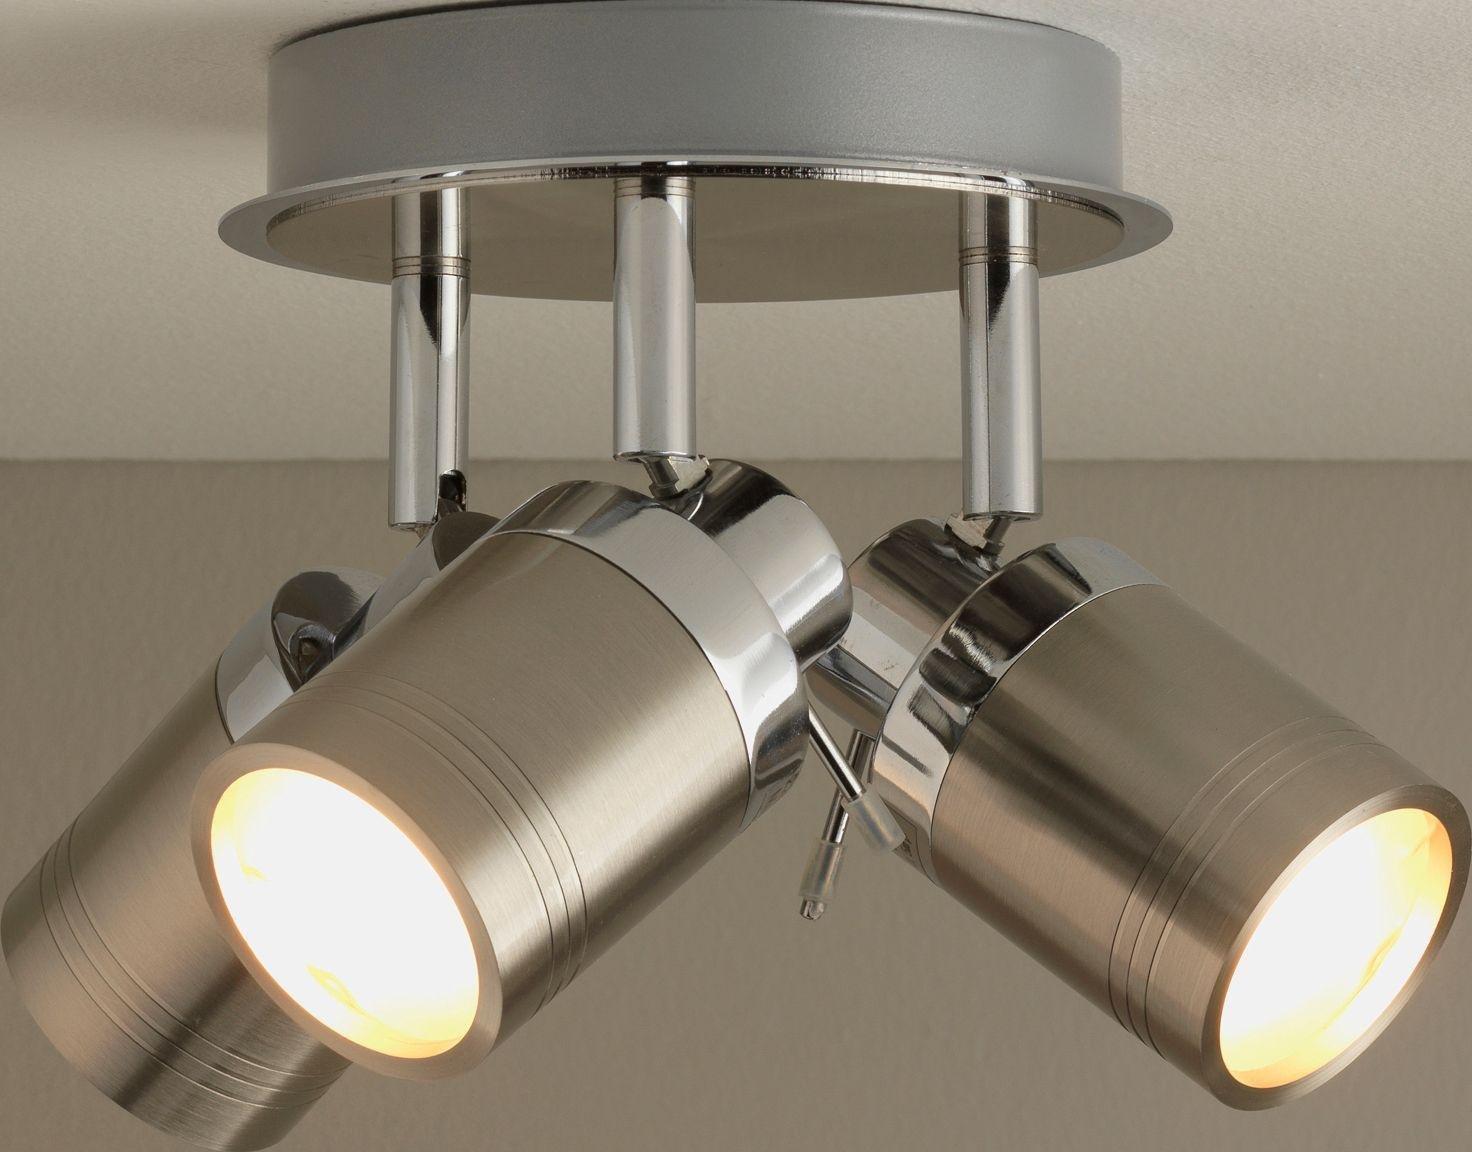 Bathroom Light Fixtures Argos buy collection livorno 3 light bathroom spotlight - chrome at